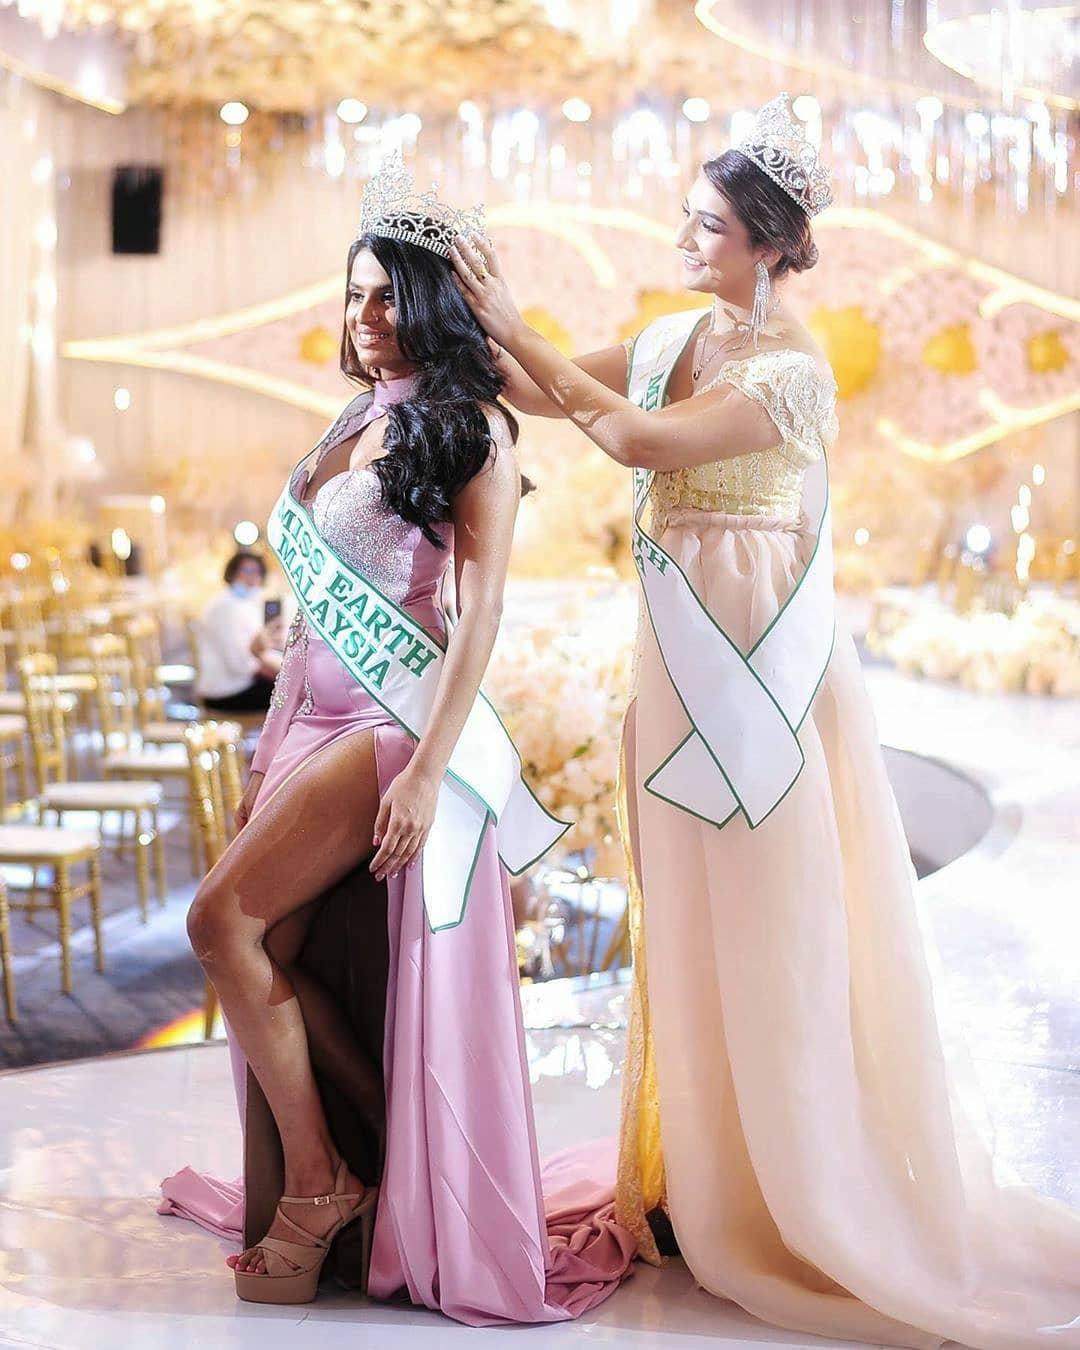 nisha thayananthan, miss earth malaysia 2020. I6uiznok